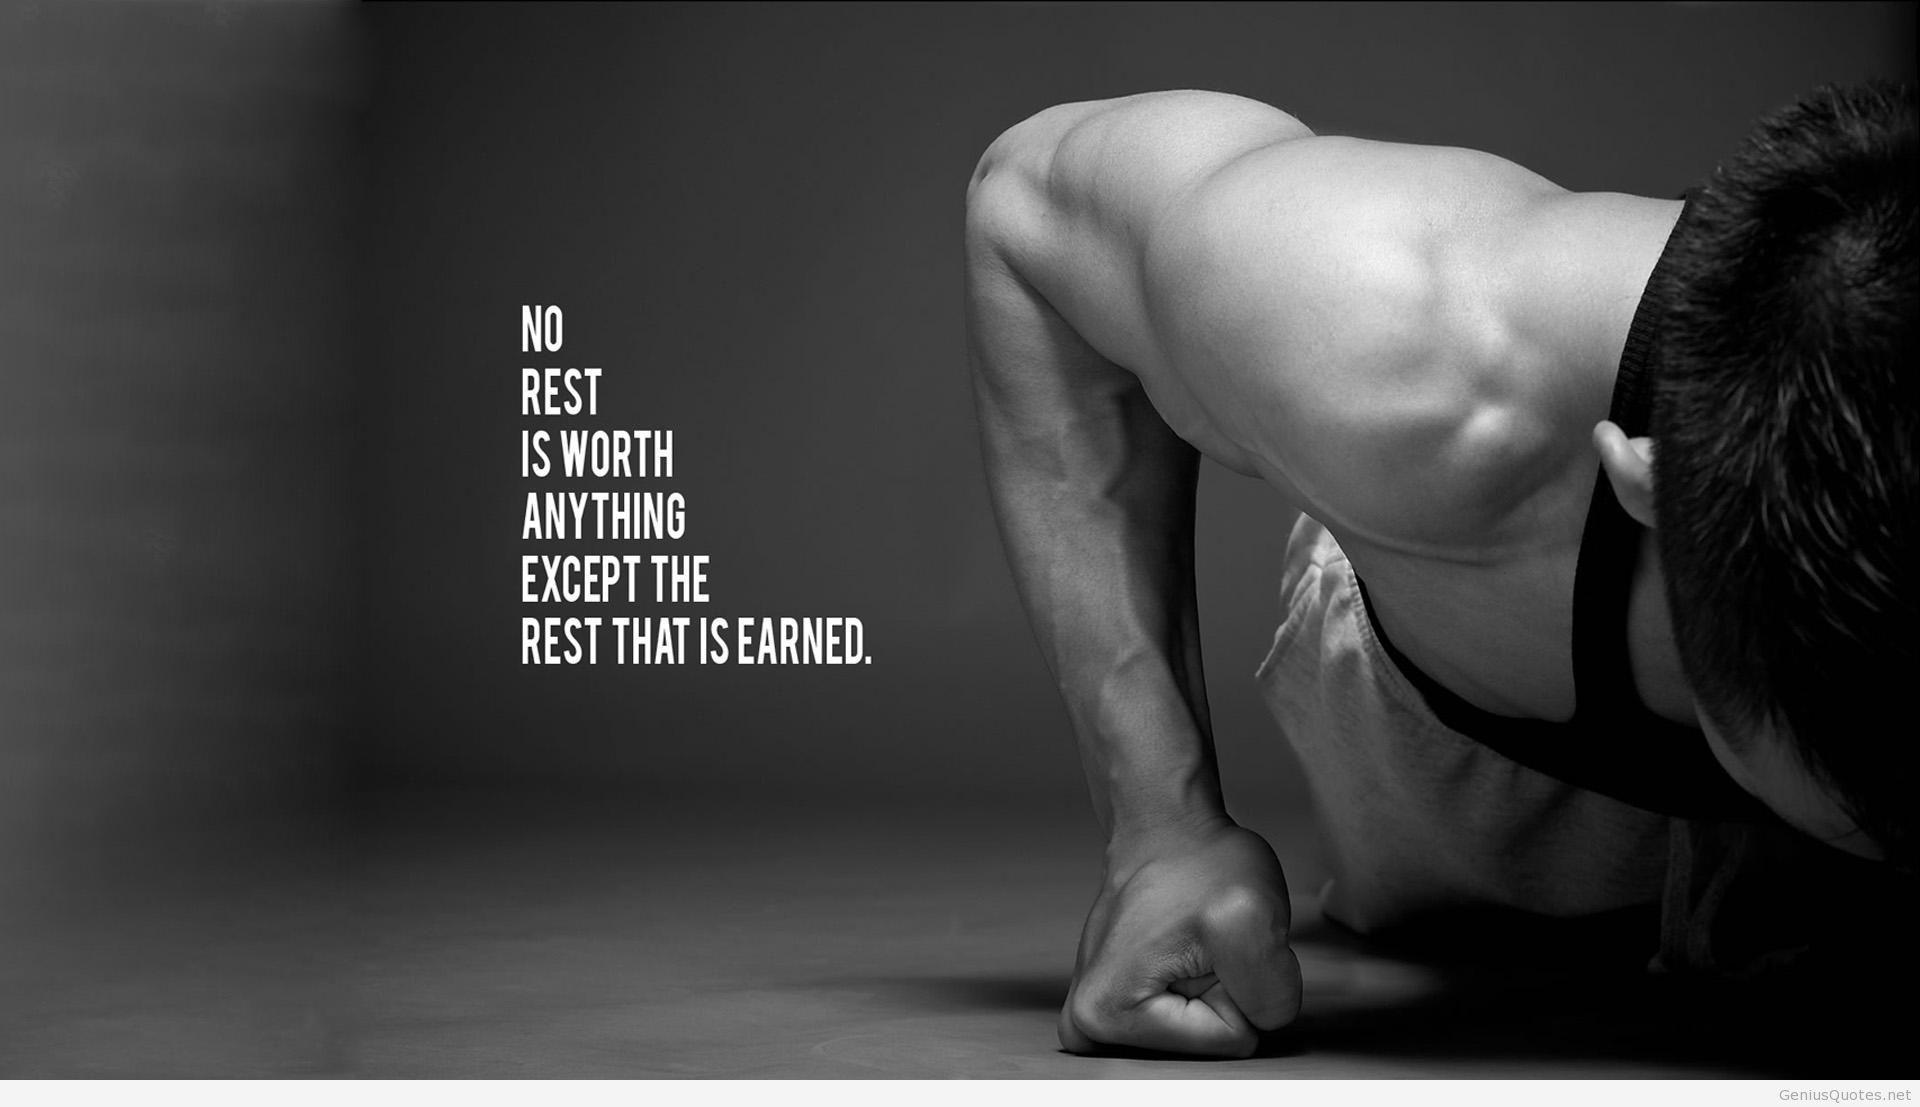 Bodybuilding Quote HD Wallpaper